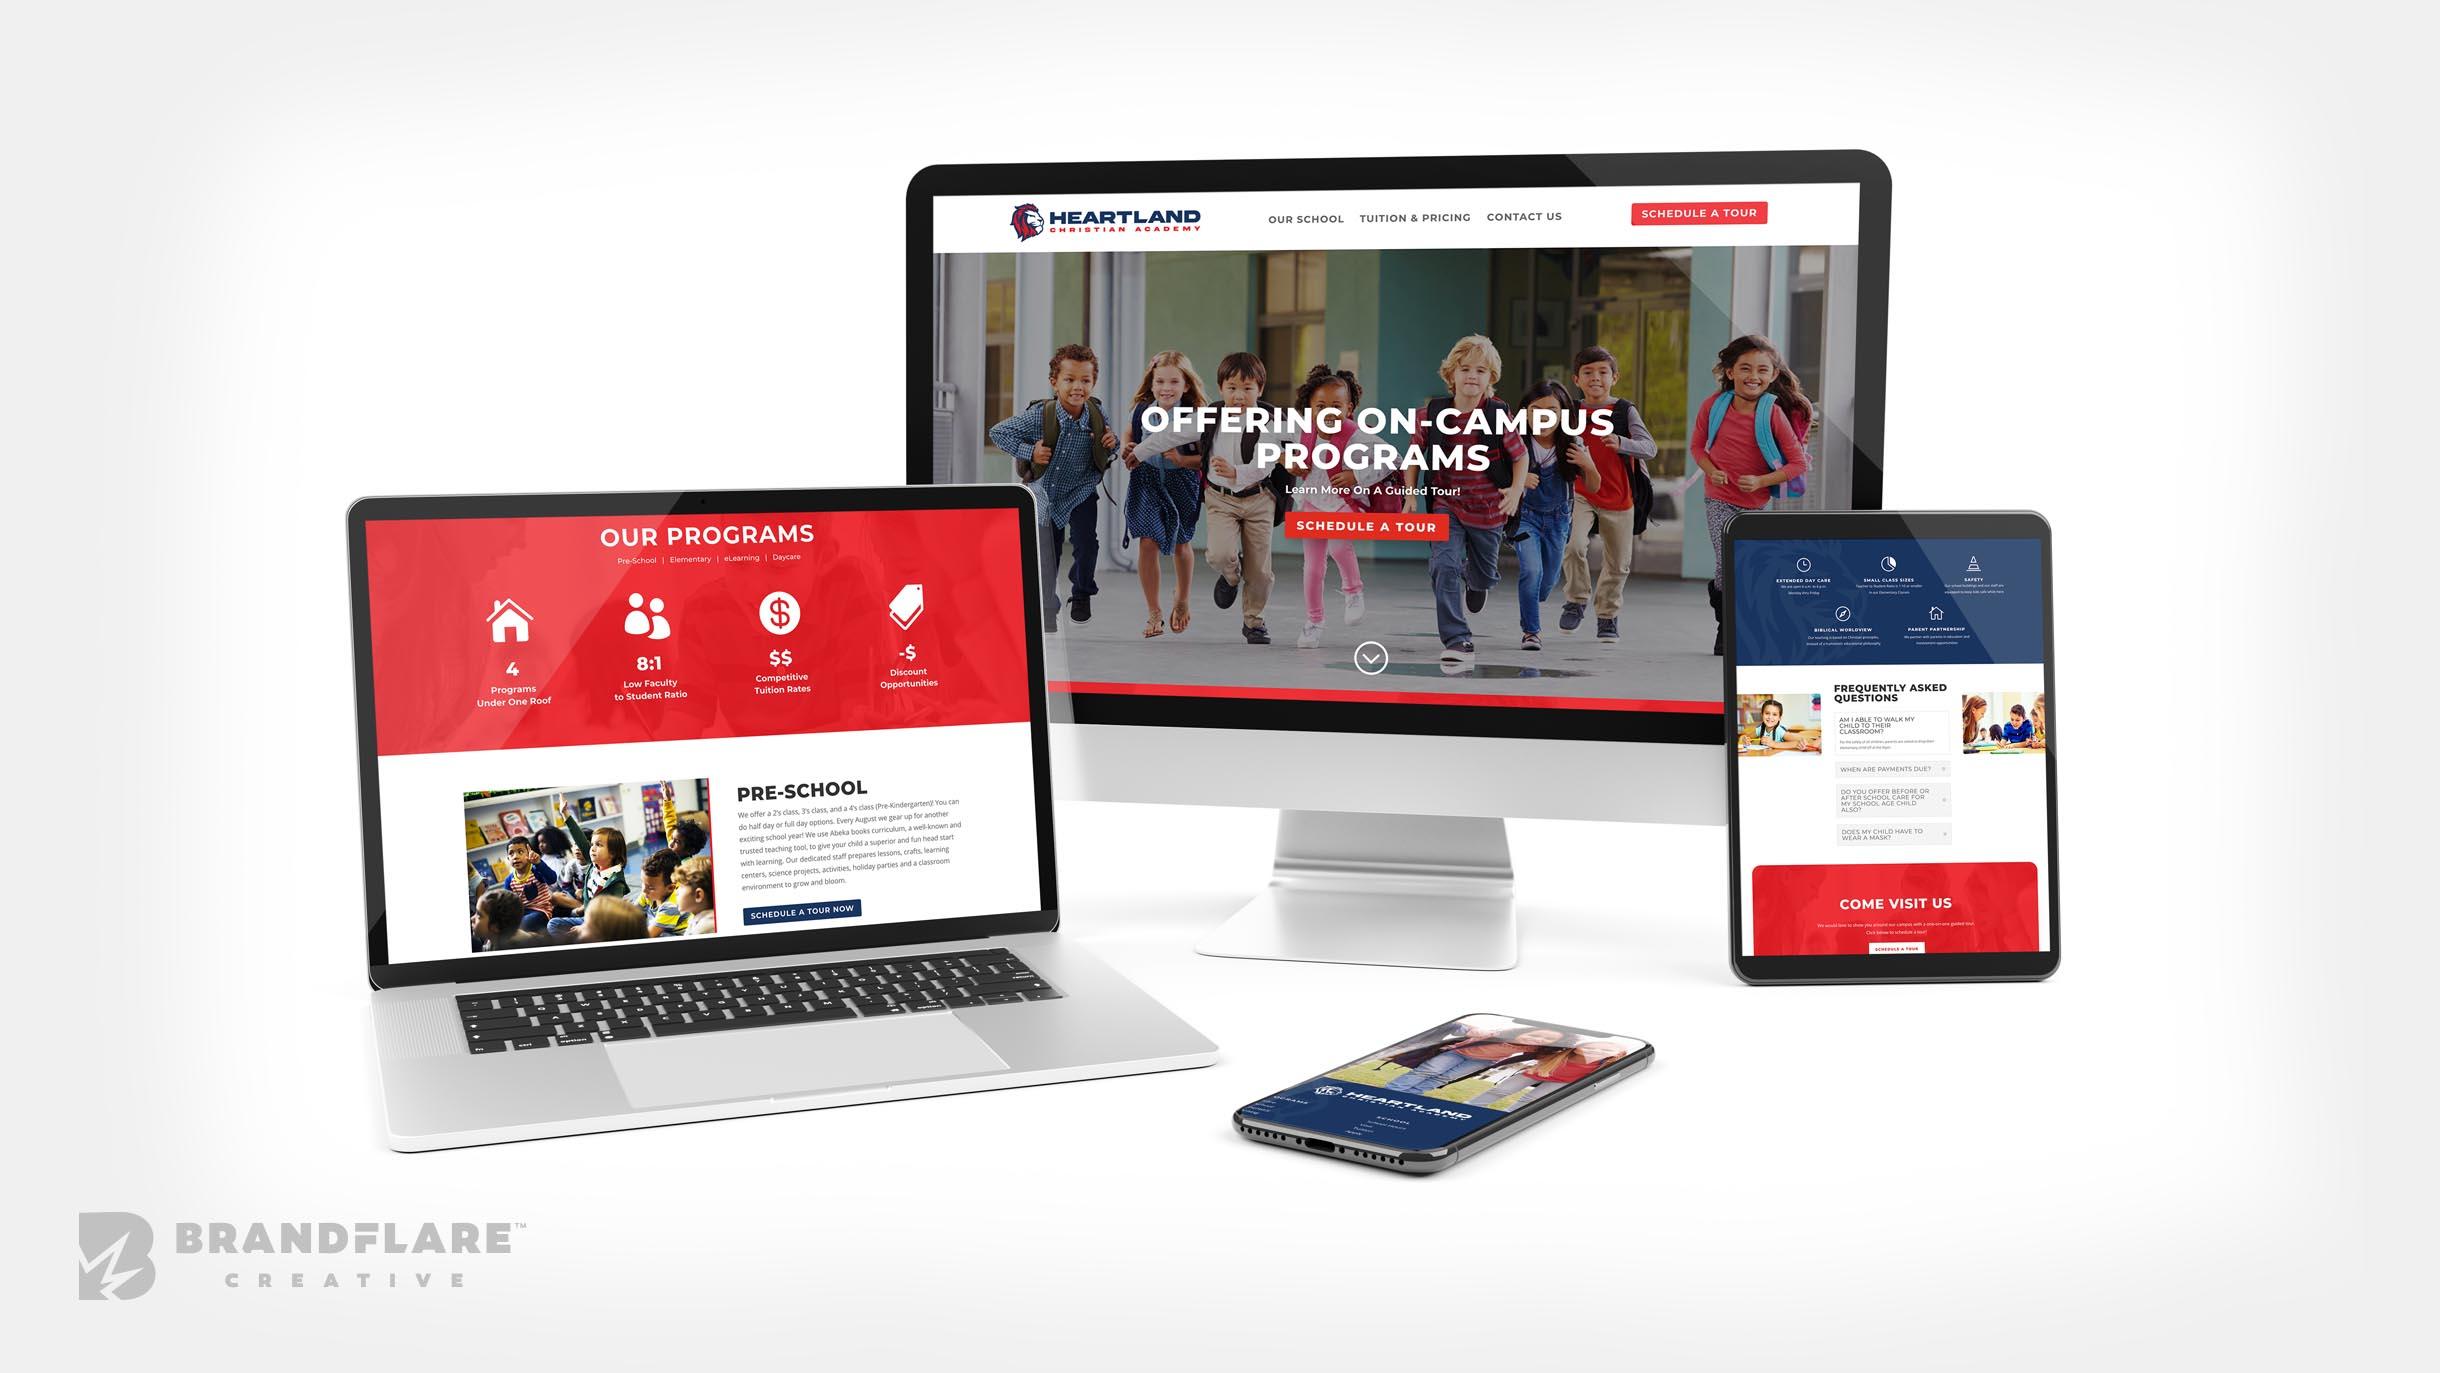 Heartland Christian Academy - School Website Design and Development - BrandFlare Creative